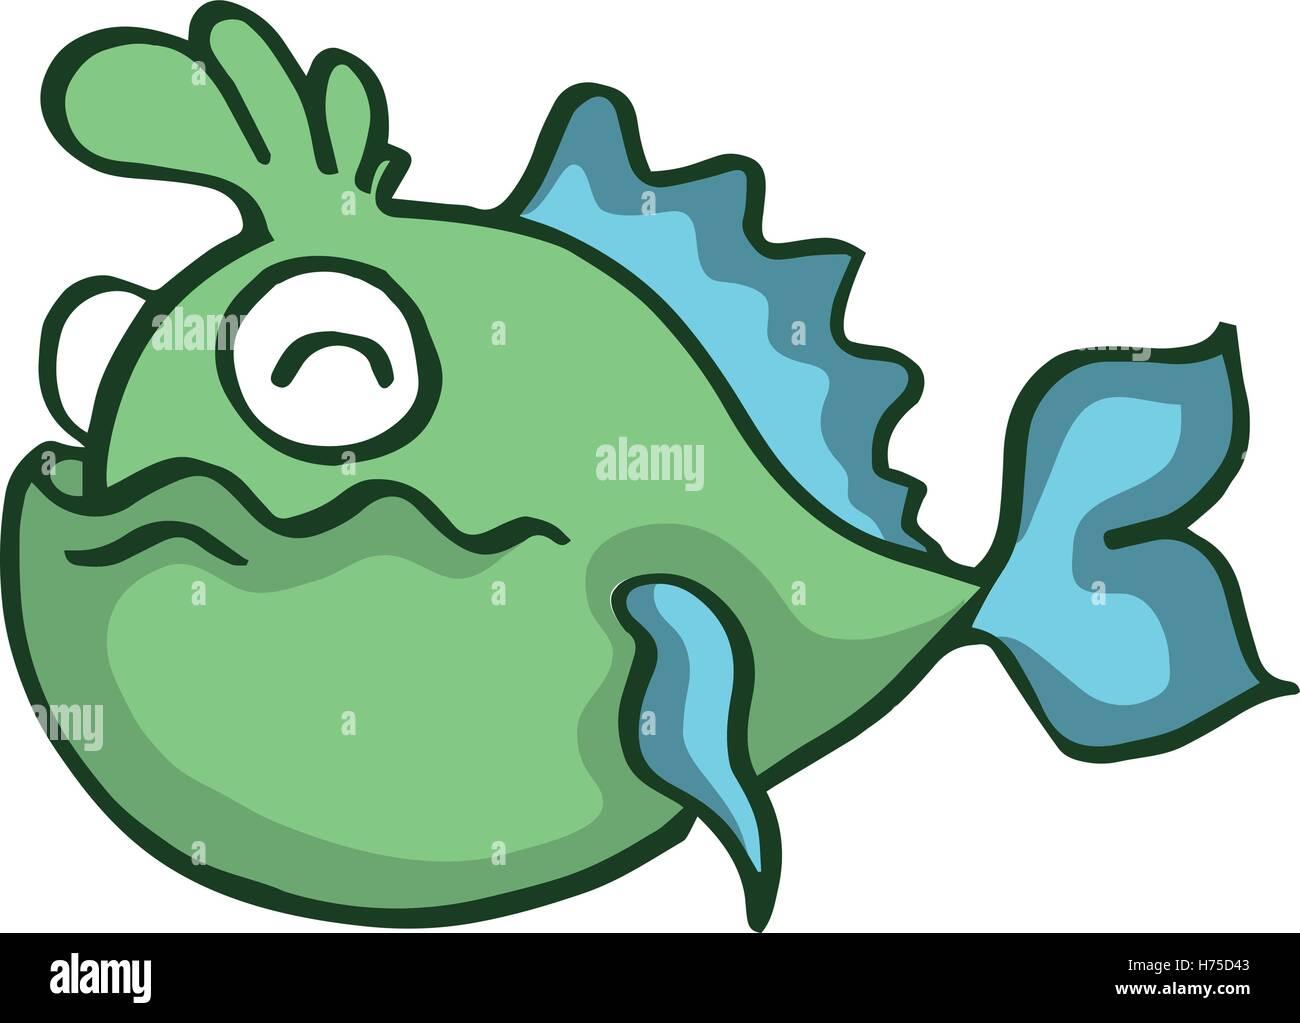 Fish Character Stock Photos & Fish Character Stock Images - Alamy